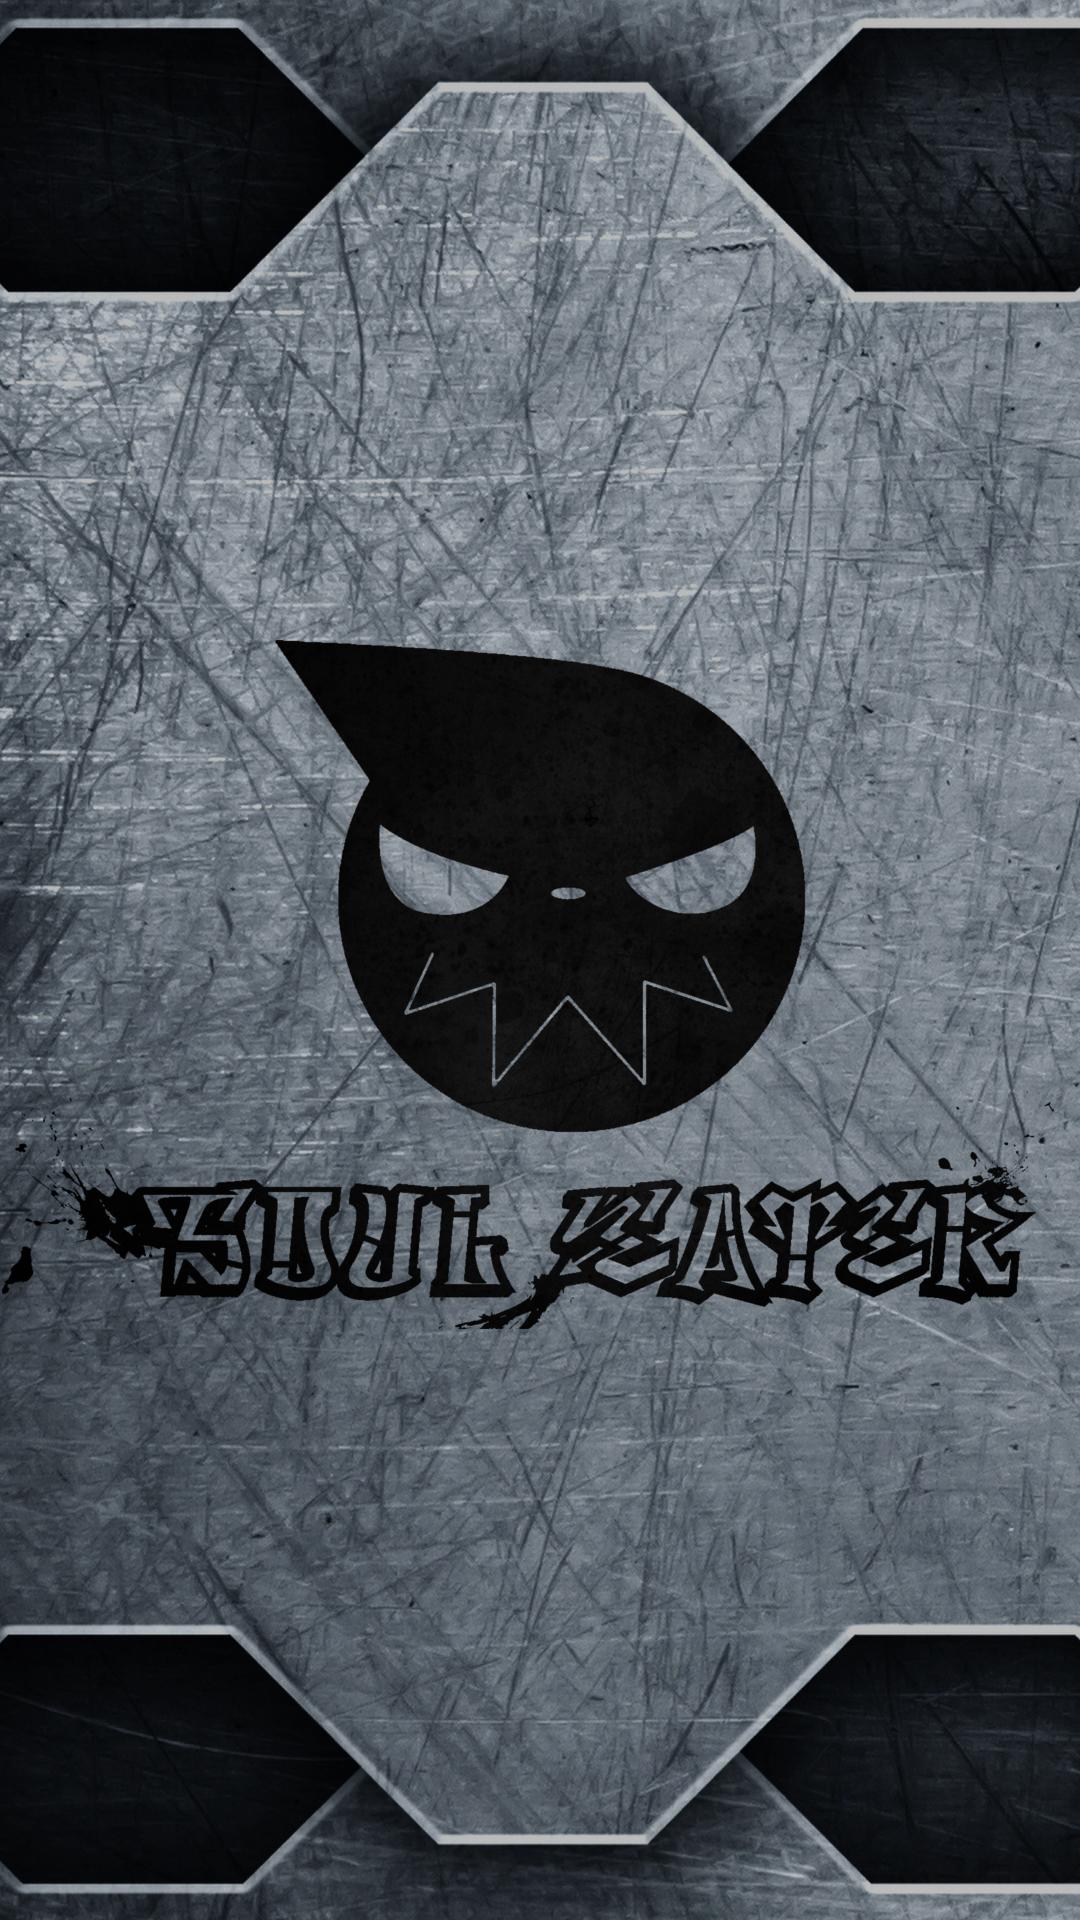 Soul Eater Smartphone Wallpaper Fullhd By Yoincauto On Deviantart